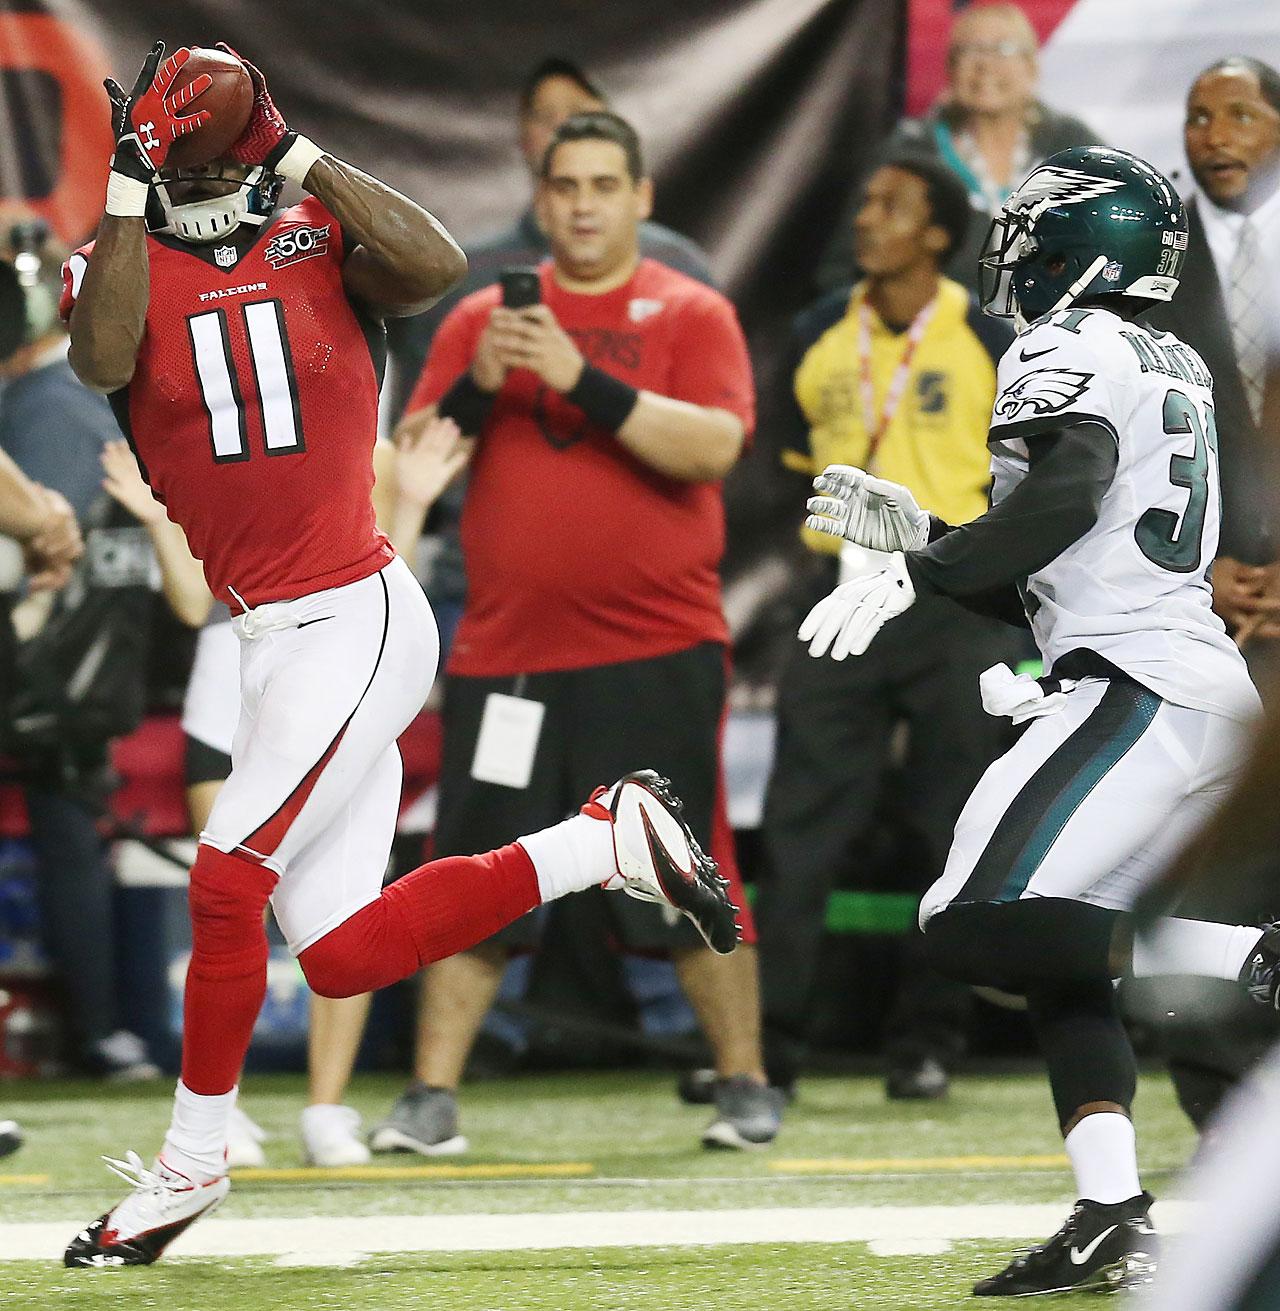 Atlanta Falcons wide receiver Julio Jones makes a touchdown catch against Philadelphia Eagles defensive back Byron Maxwell.